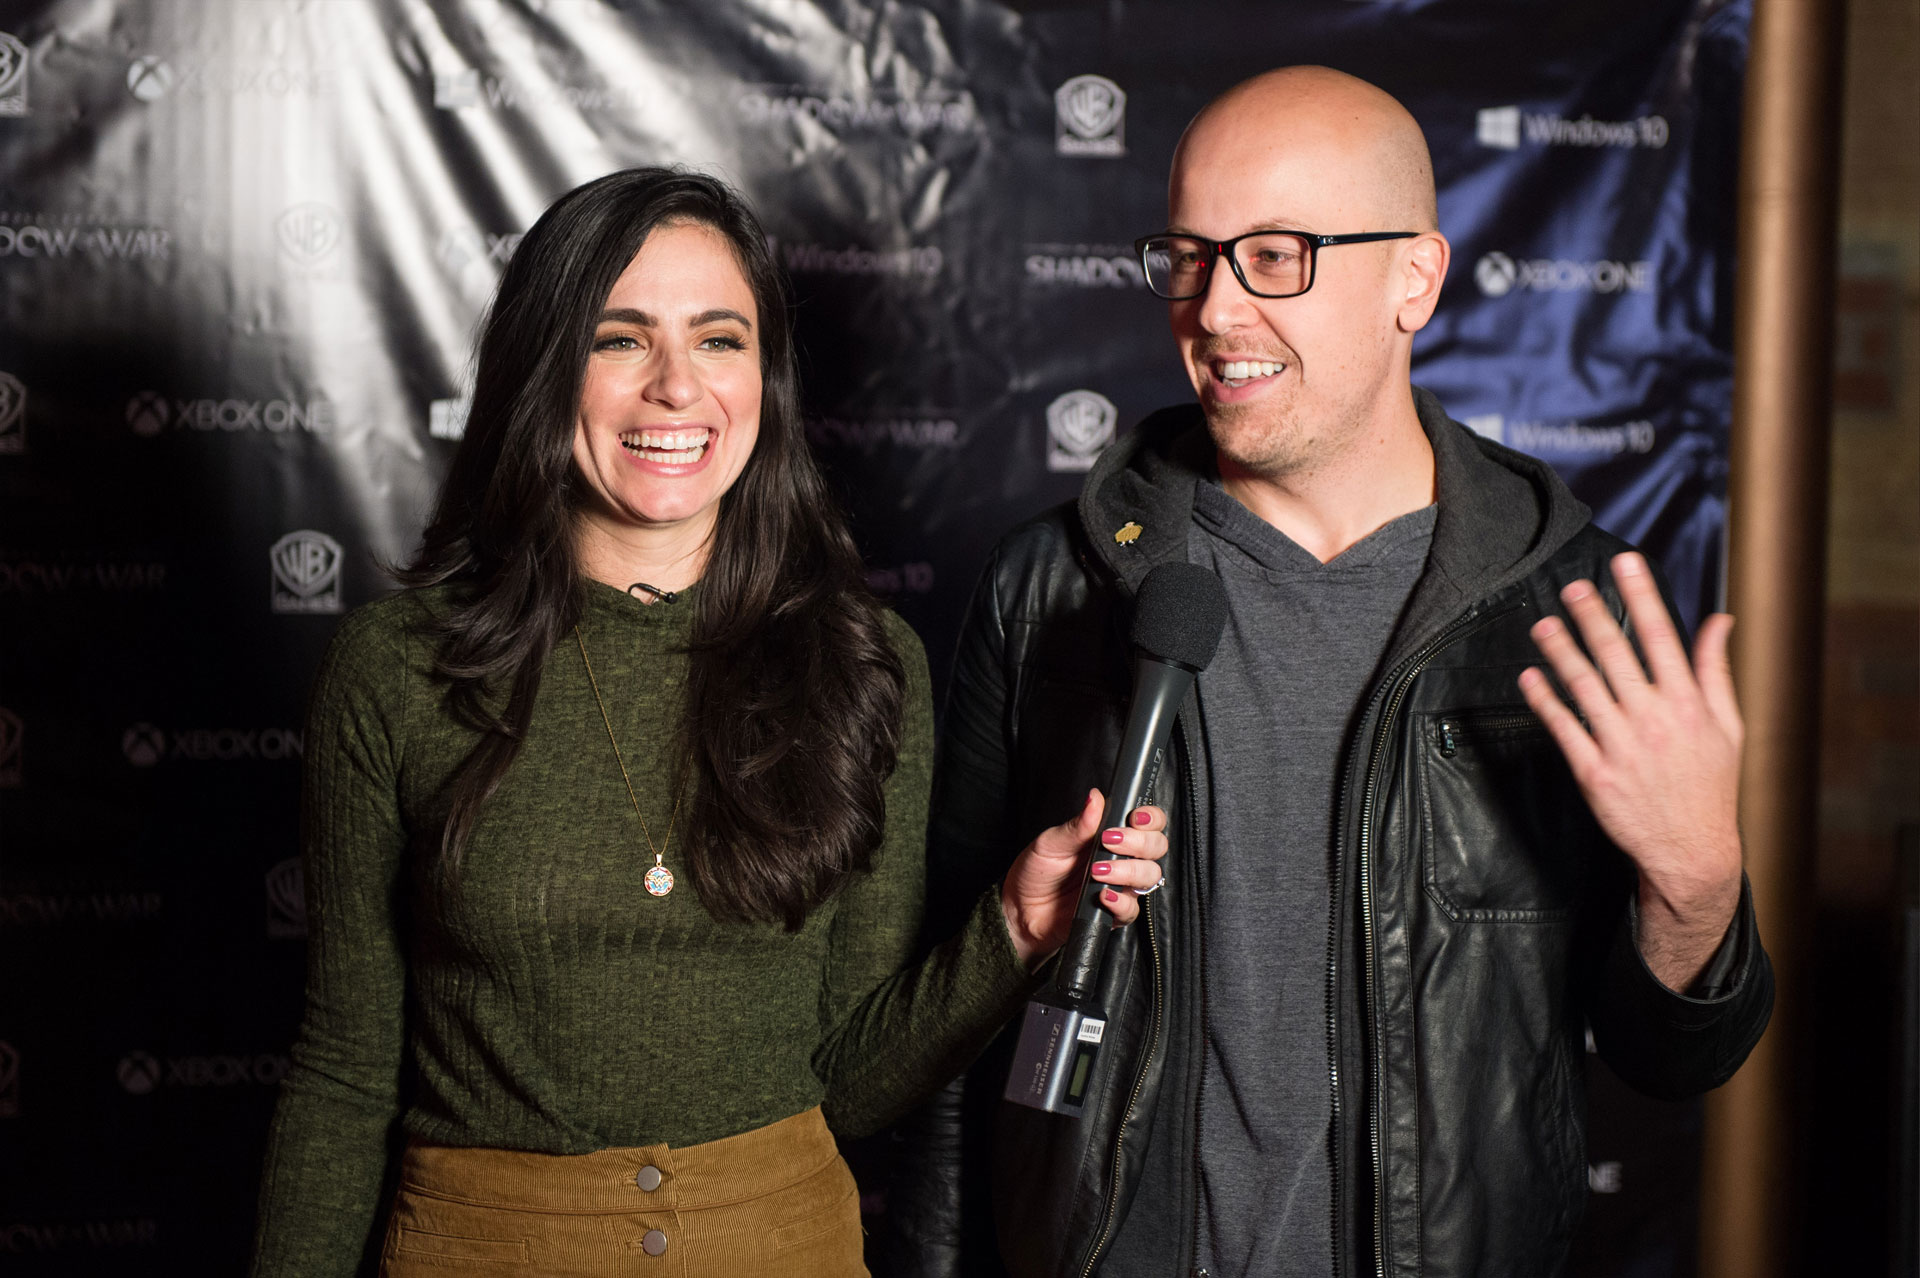 Monolith spokesperson, Andy Salisbury, interviewed by Marissa Roberto, host of XboxAllForOne. (Photo by Evan Bergstra)